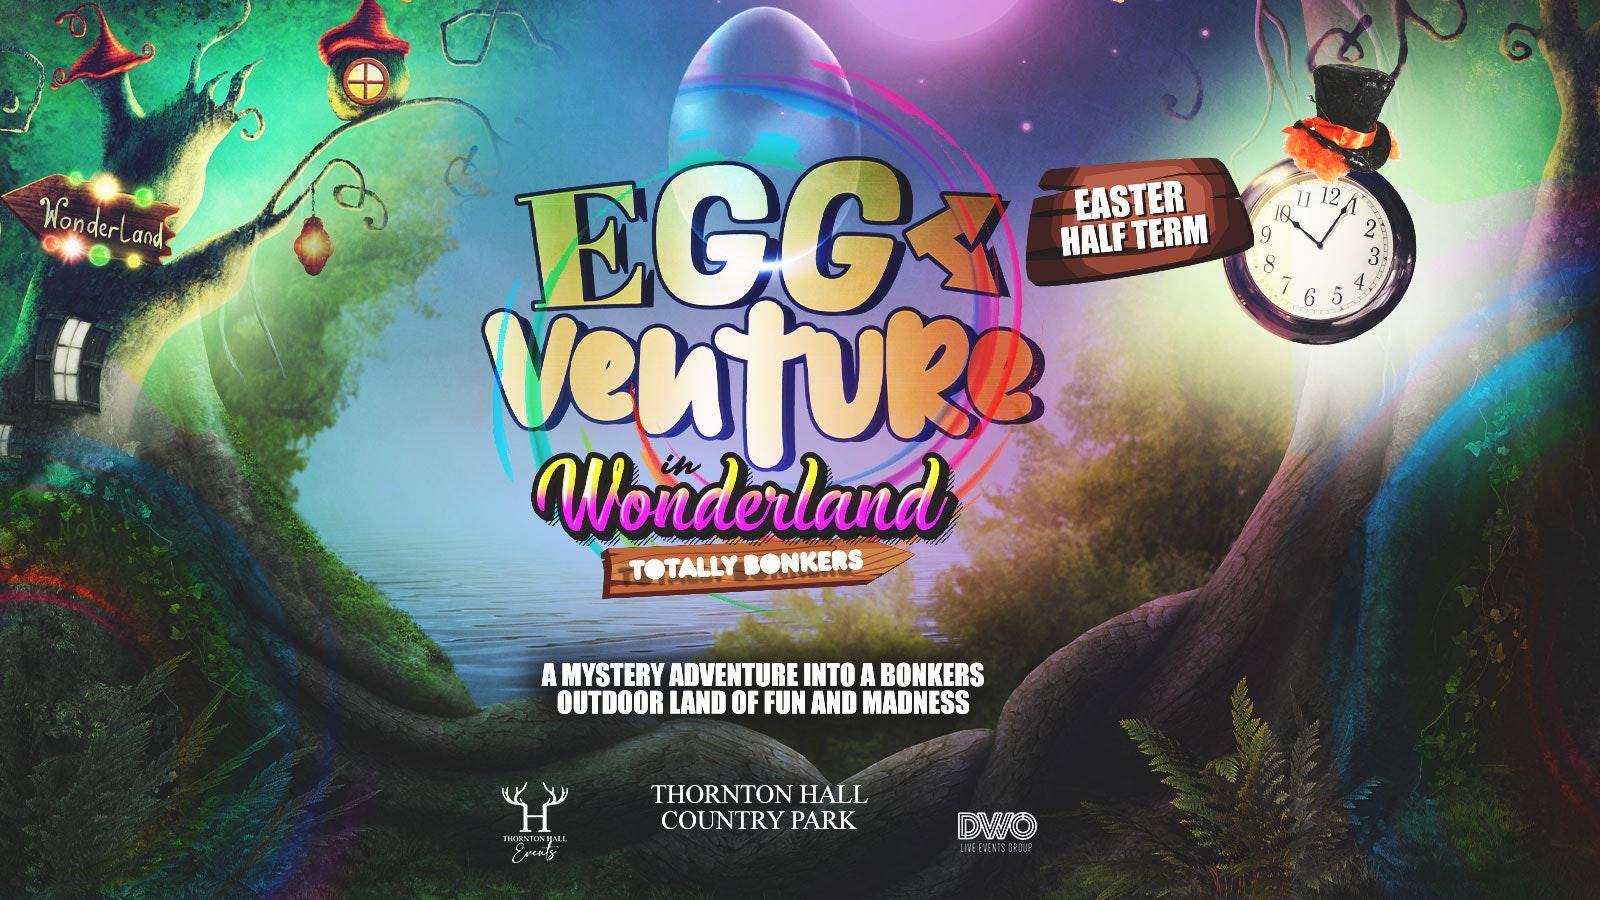 EggVenture in Wonderland – Tuesday 30th March – 1pm